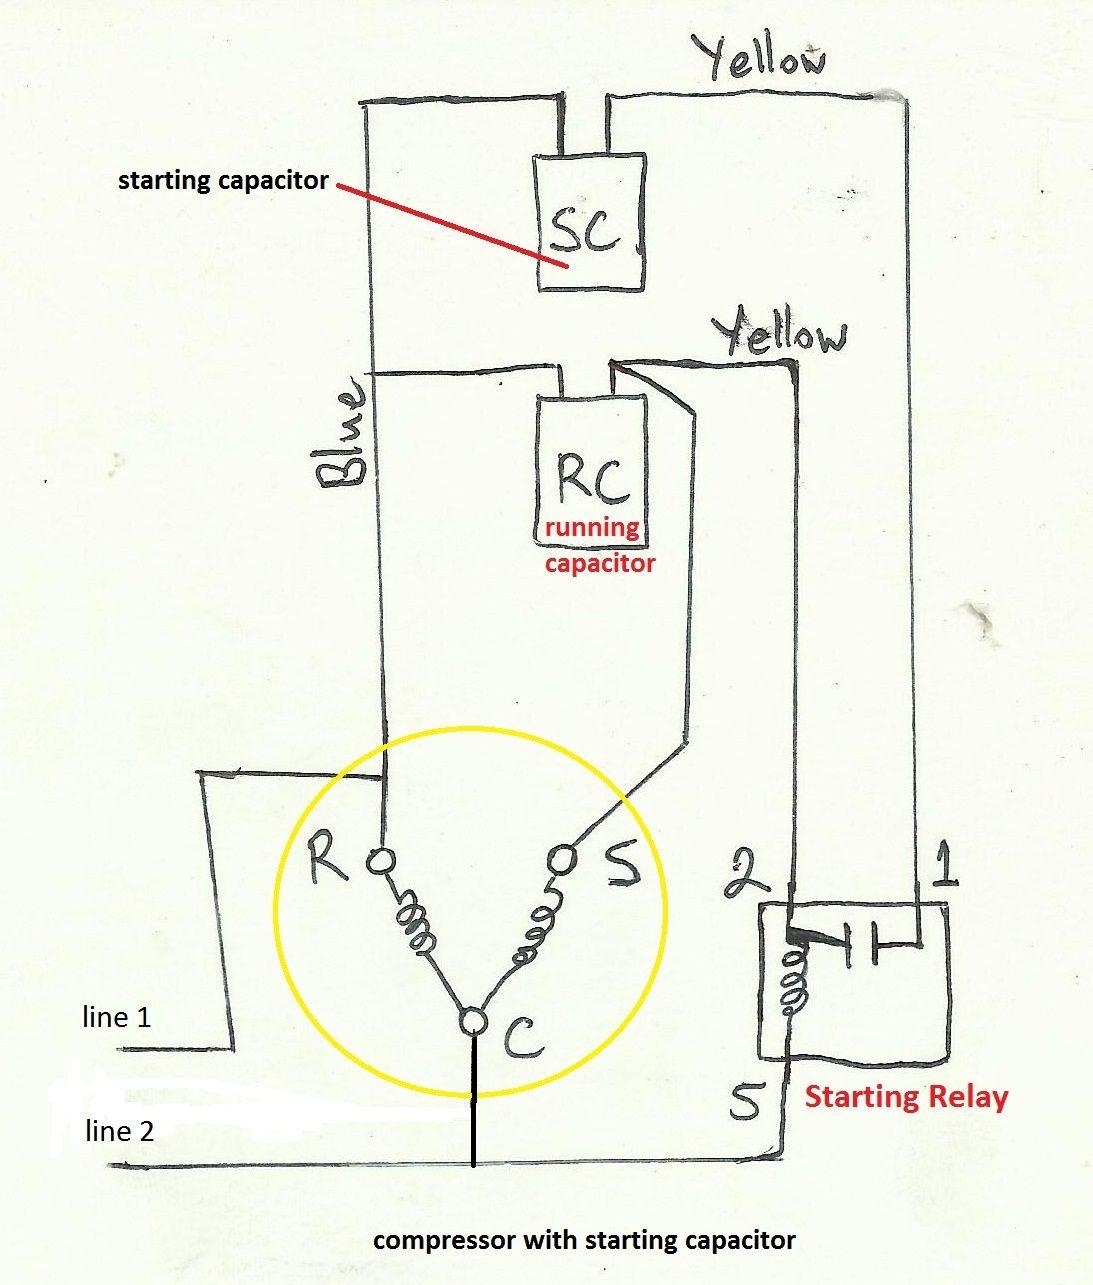 Wiring Diagram Of Capacitor Start Motor Copy Electric Webtor - Capacitor Start Motor Wiring Diagram